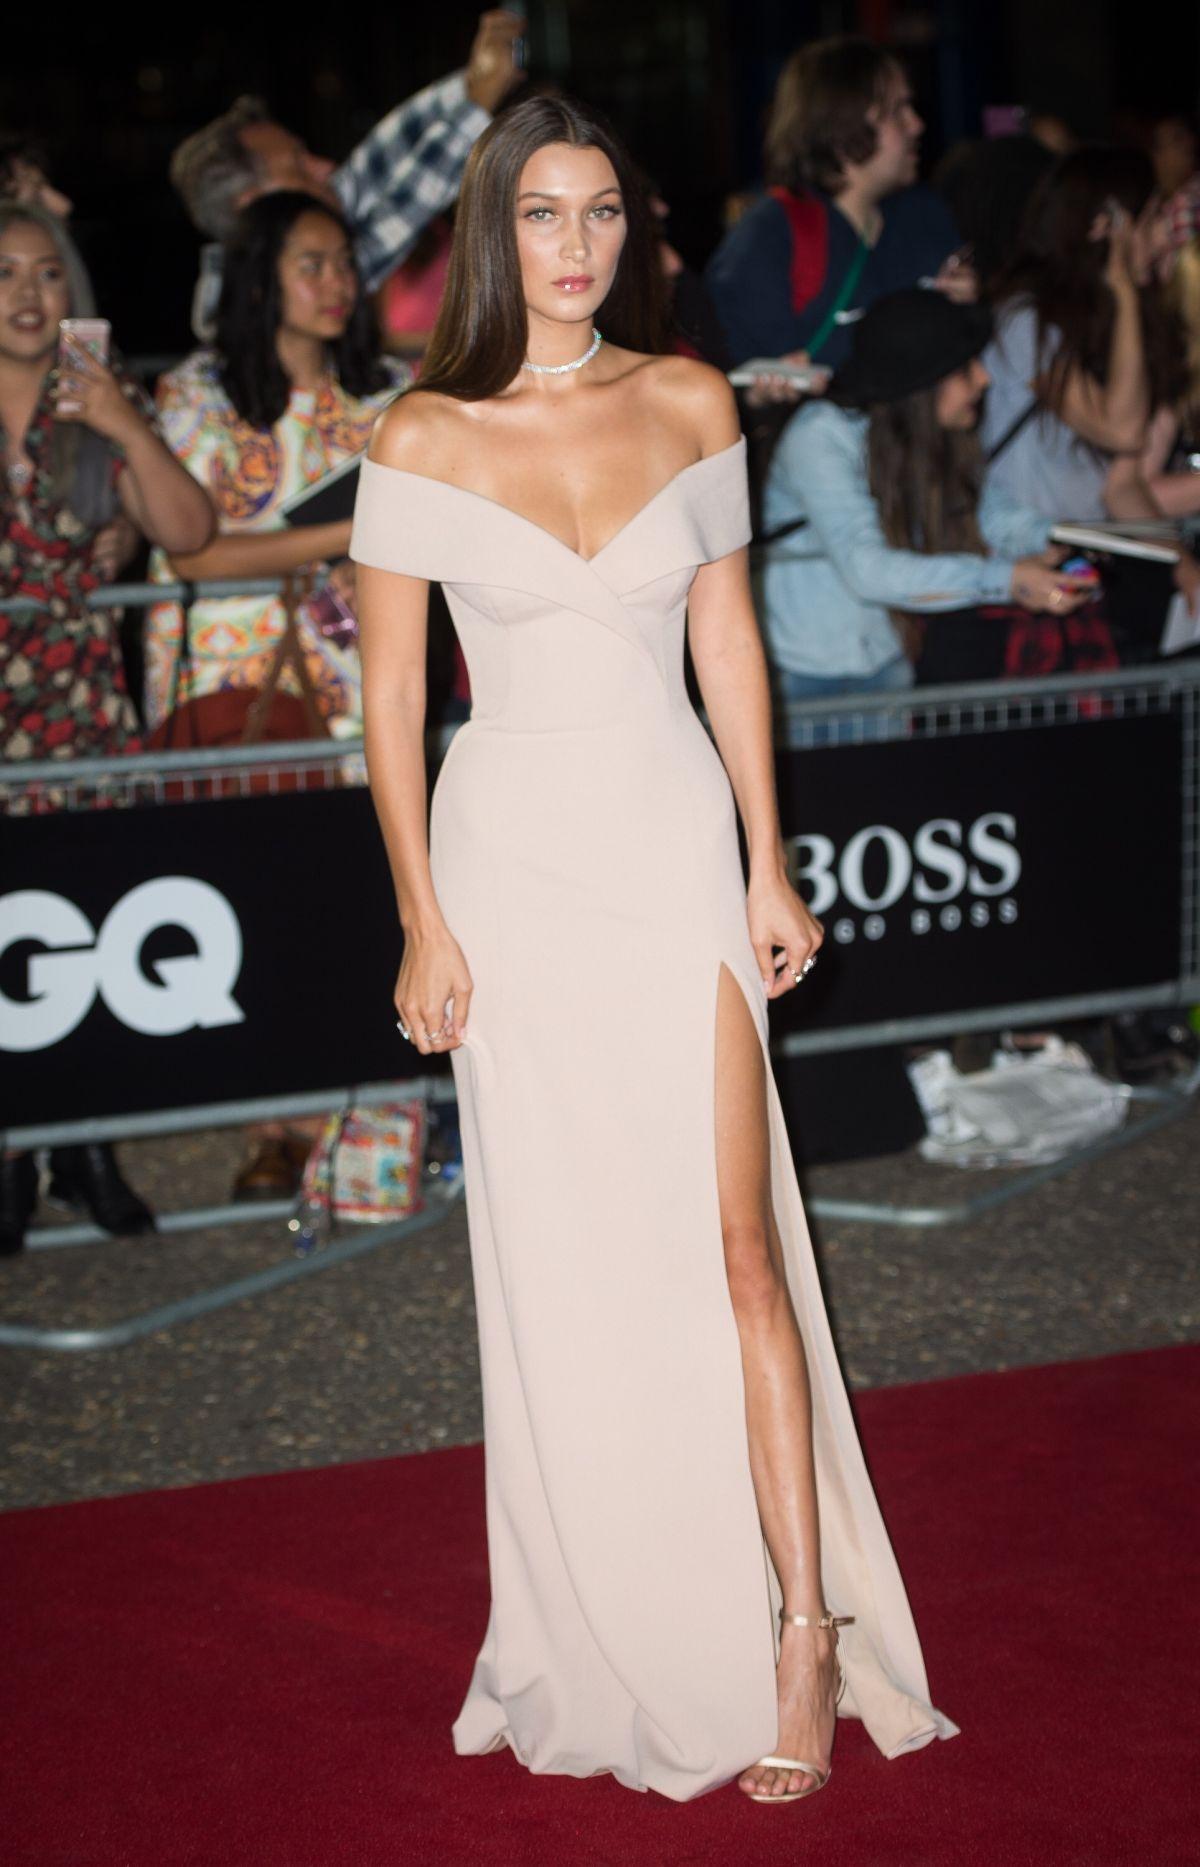 Bella Hadid - GQ Men Of The Year Awards 2016 in London